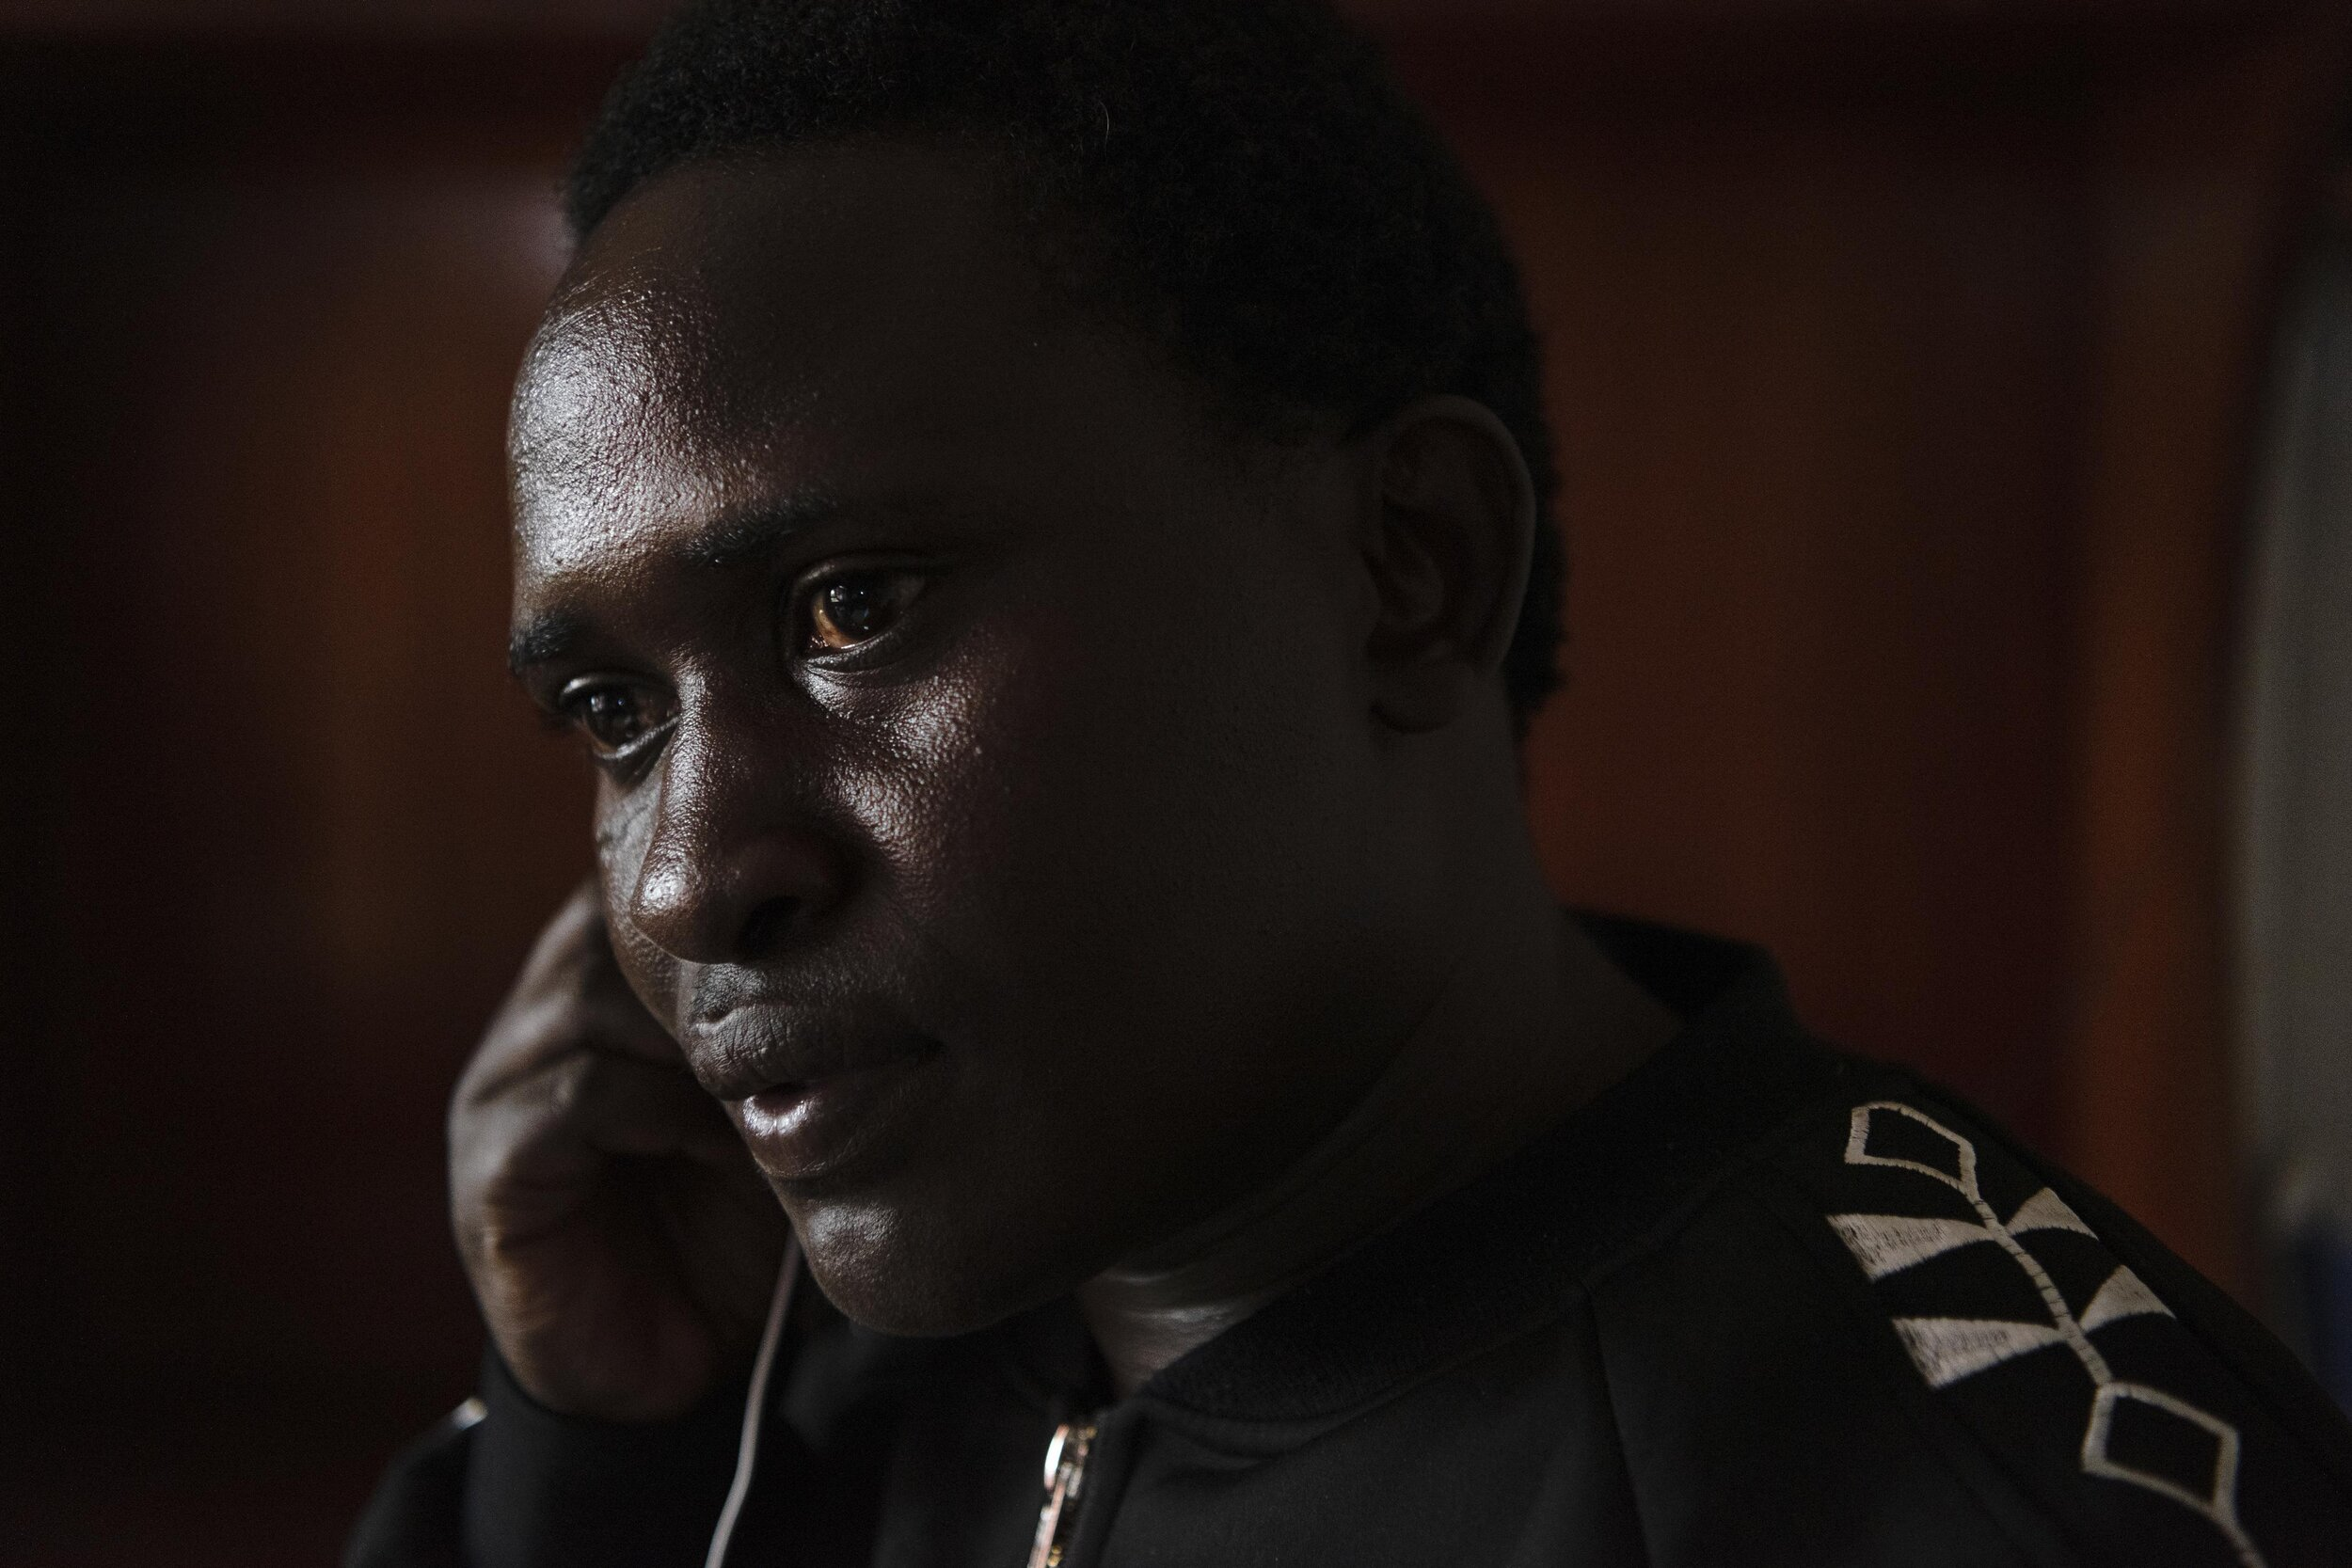 Kwaboka Kibagendi, the executive director of Jinsiangu, works at his desk in an intersex, transgender and gender-nonconforming safehouse in Nairobi, Kenya. Public Radio International, 2019.